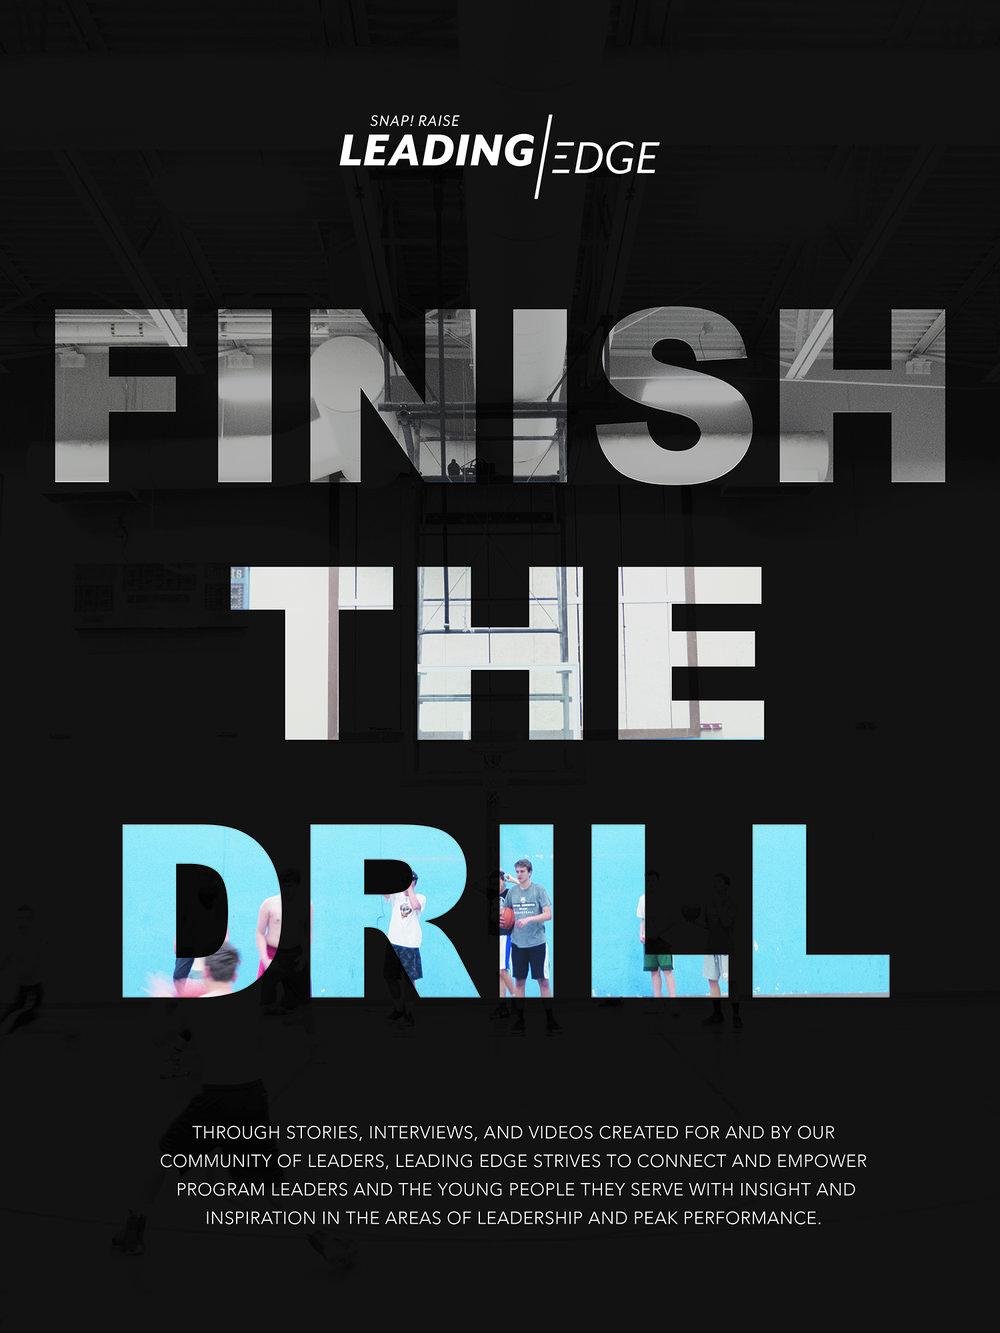 Leading Edge Quotre Poster_Finish the Drill_v03_smaller for web.jpg